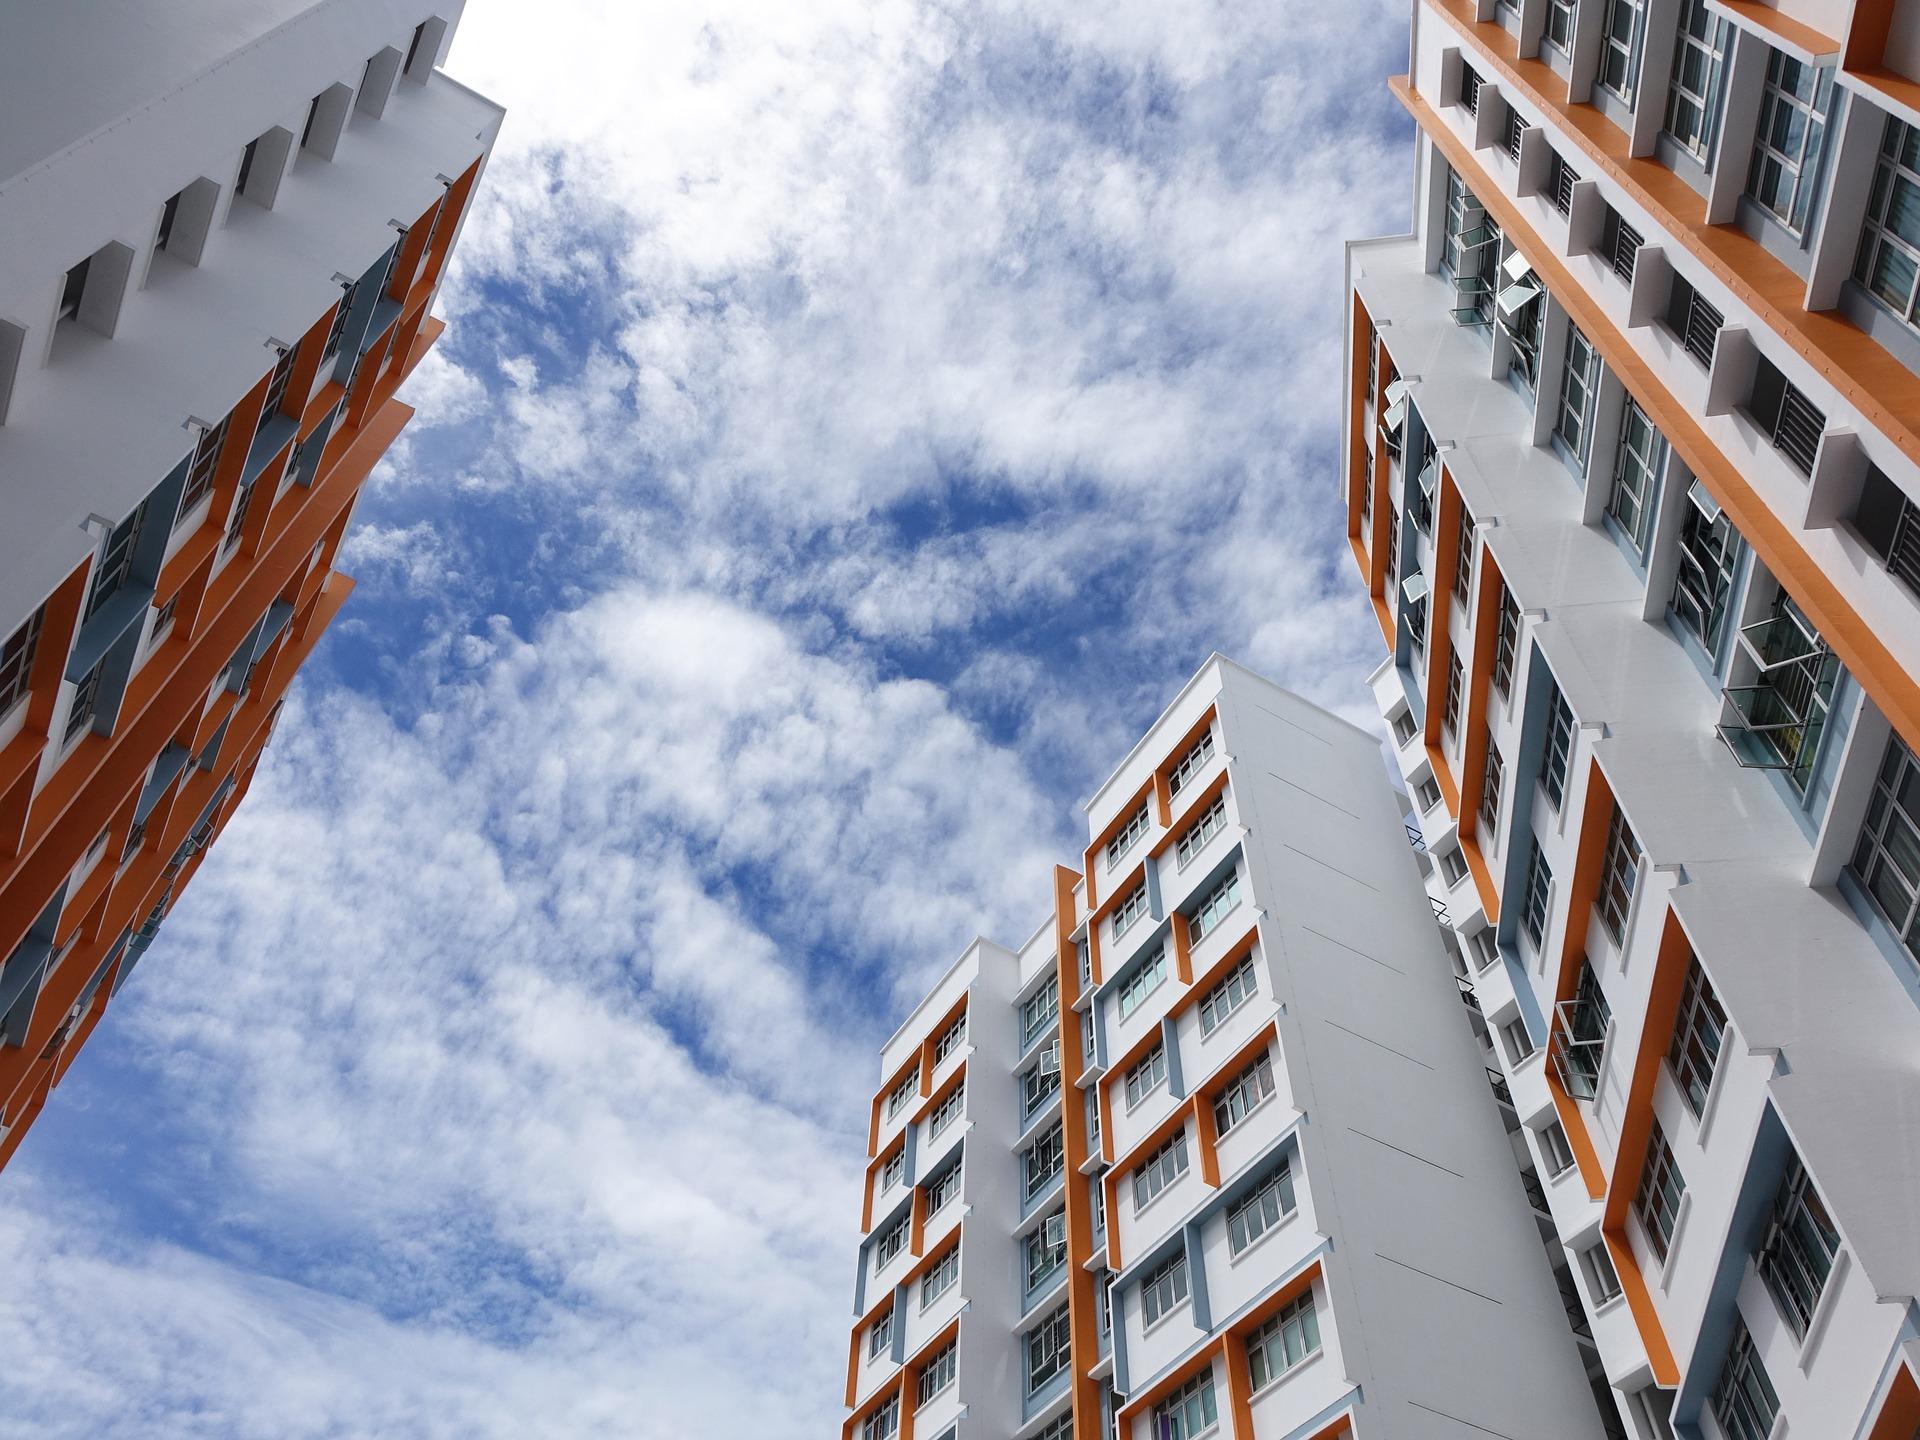 Usar la vivienda como instrumento para reducir pobreza